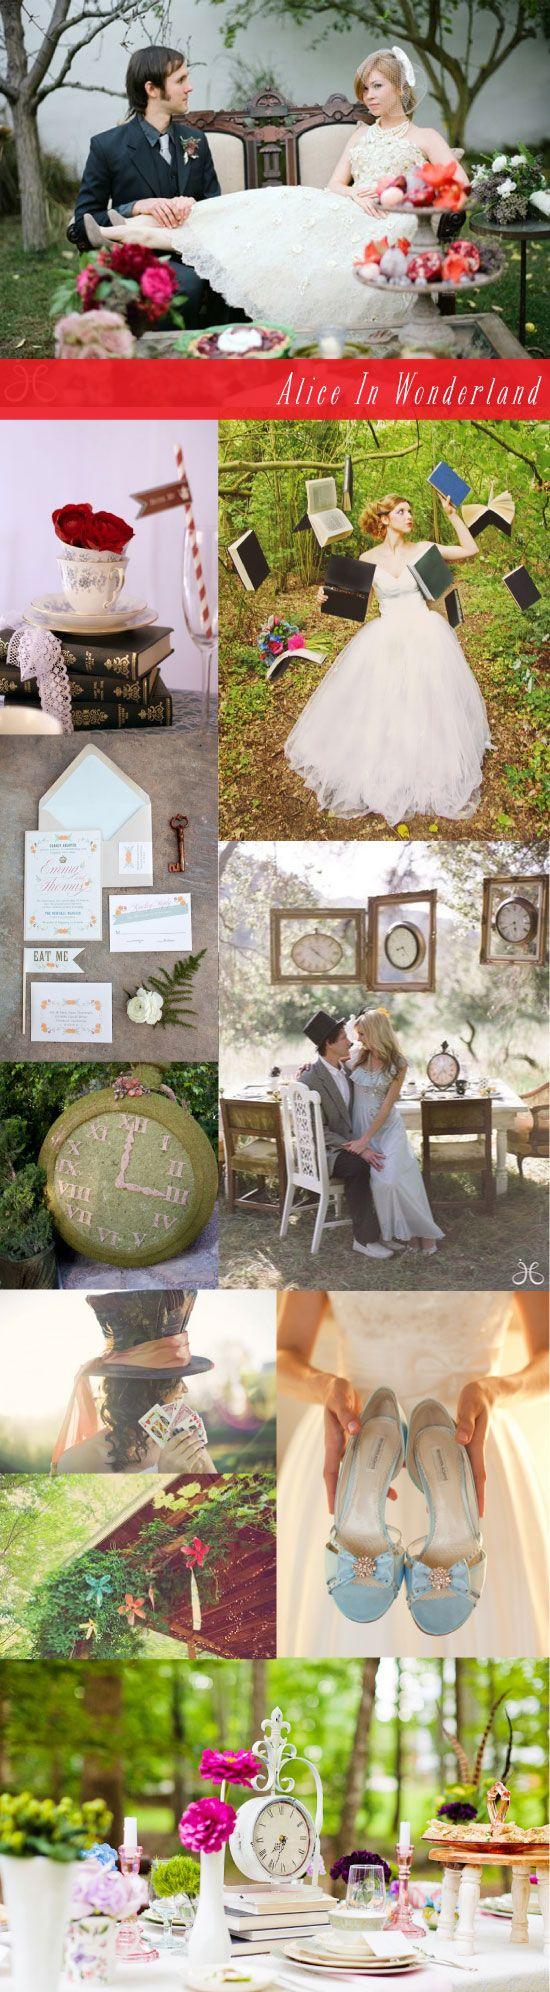 Alice in Wonderland wedding inspiration board